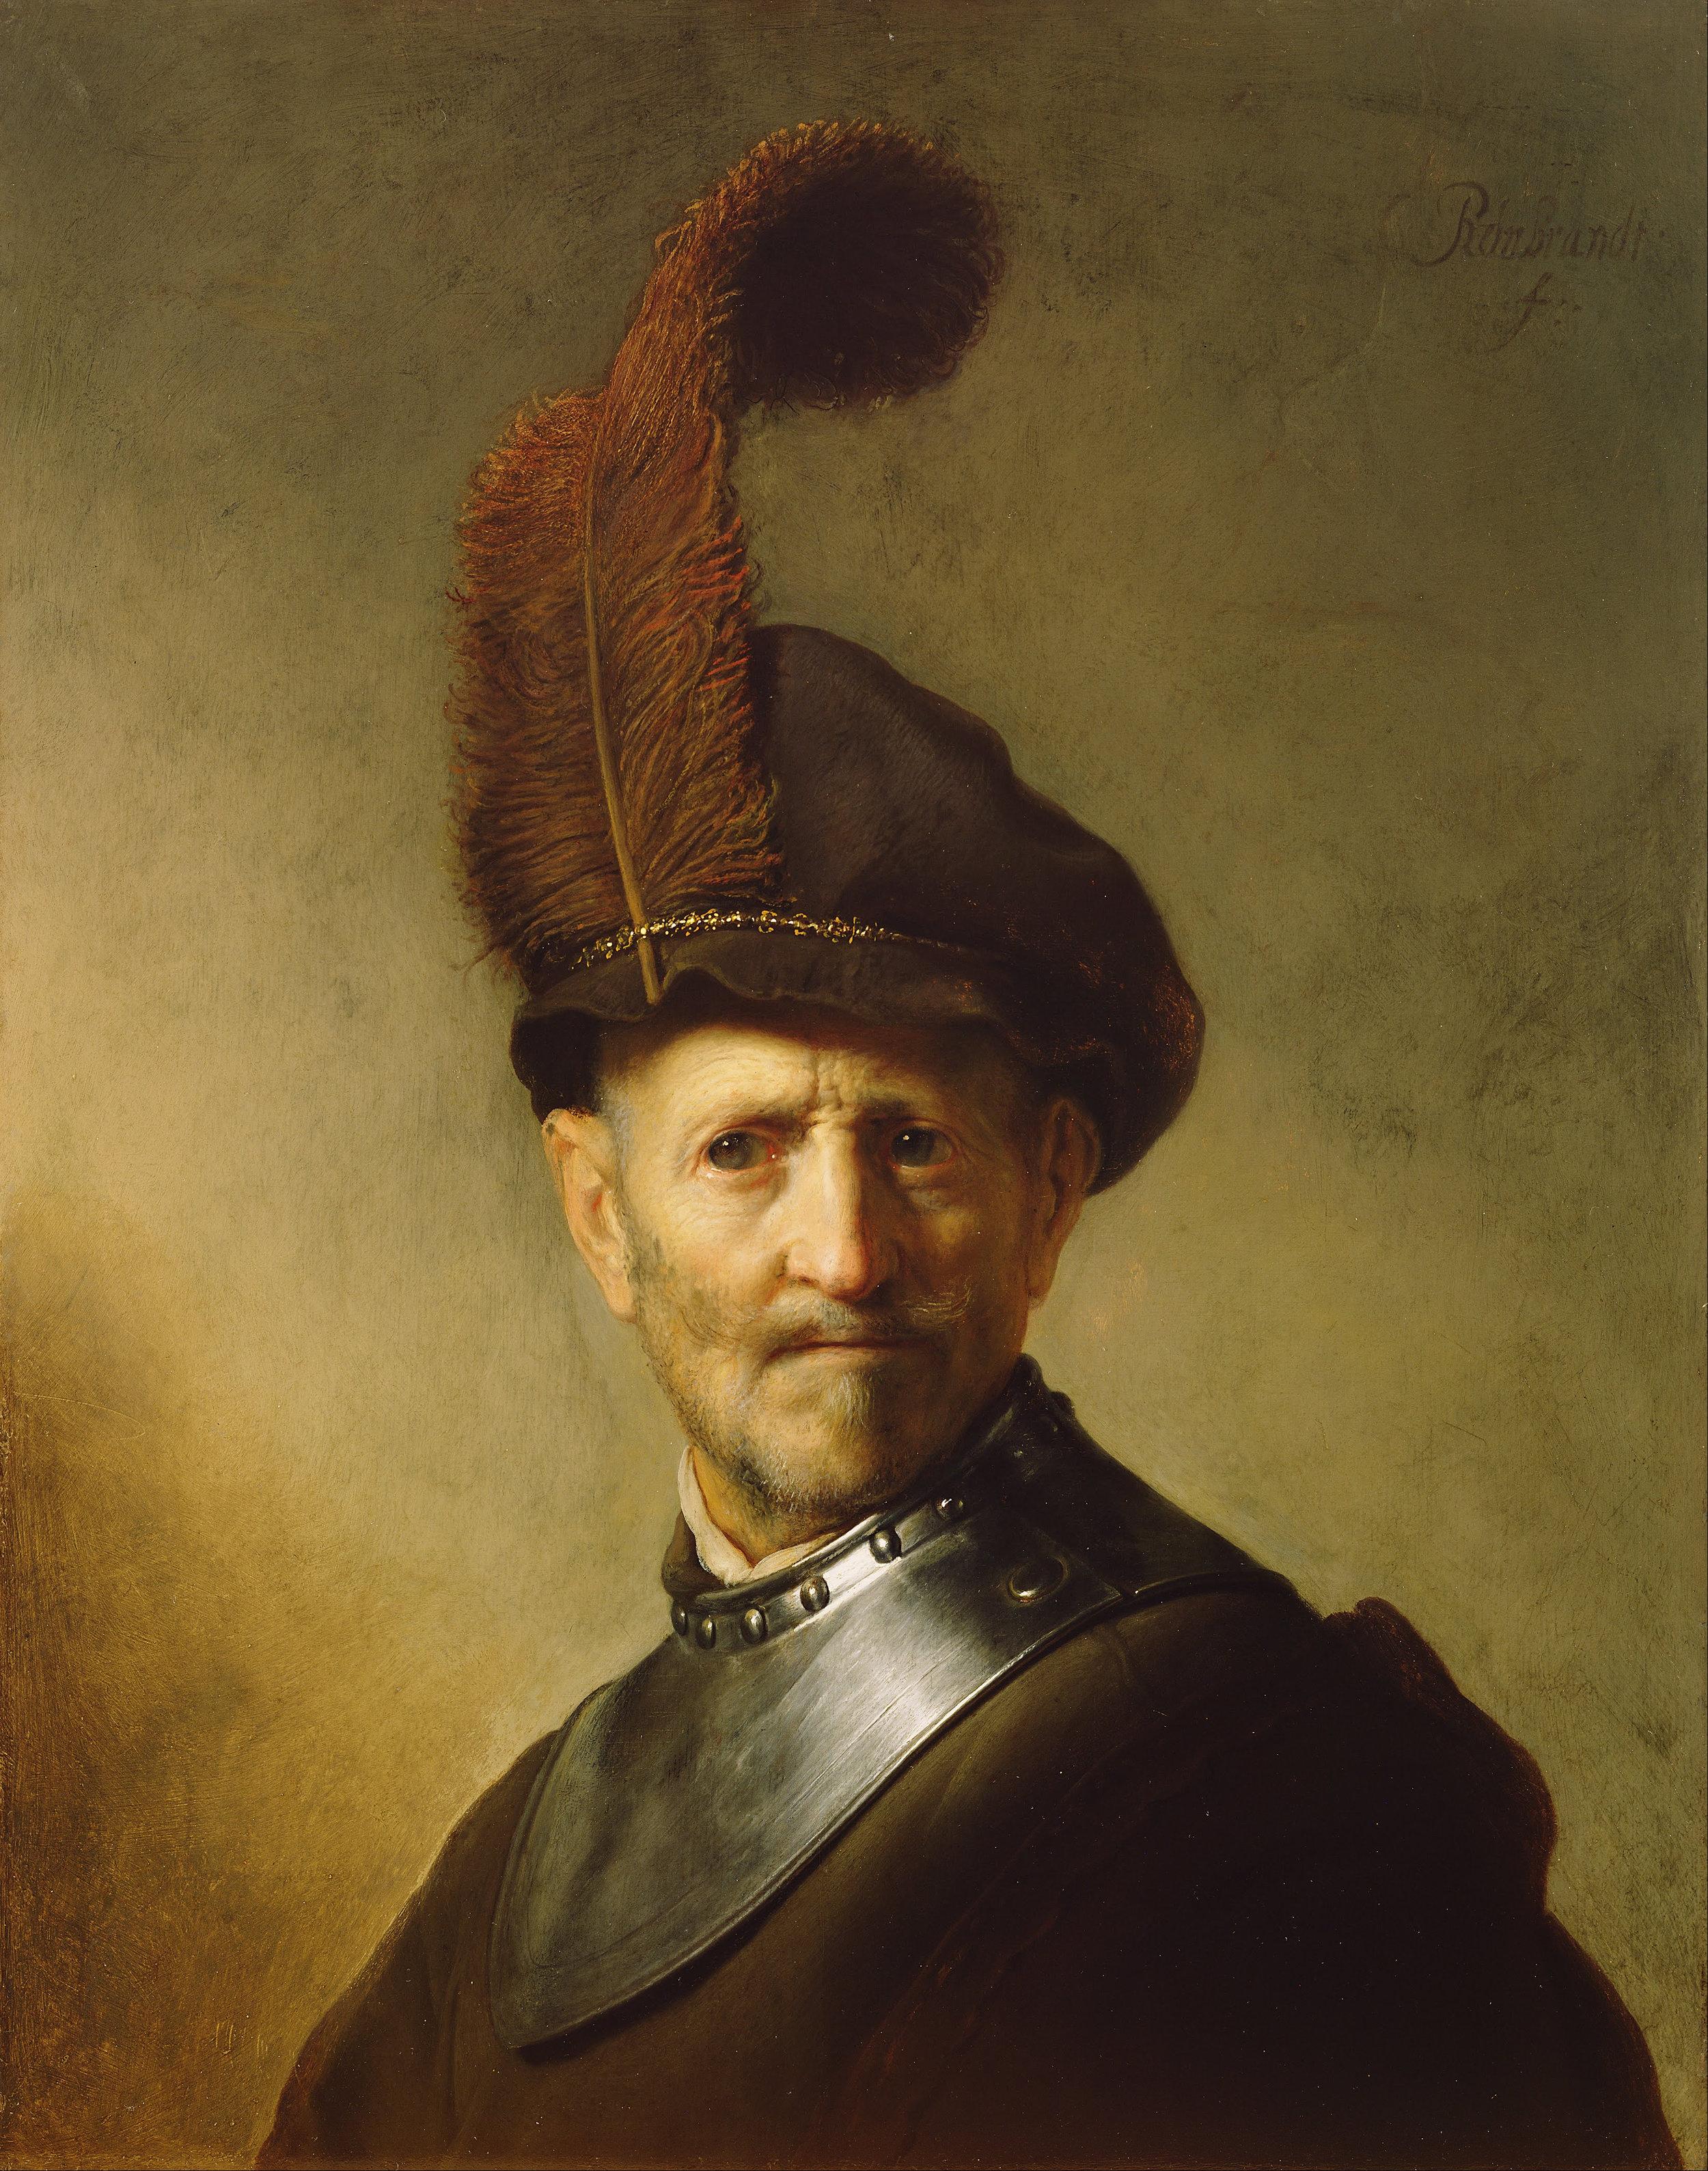 Rembrandt_Harmensz._van_Rijn_(Dutch_-_An_Old_Man_in_Military_Costume_-_Google_Art_Project.jpg